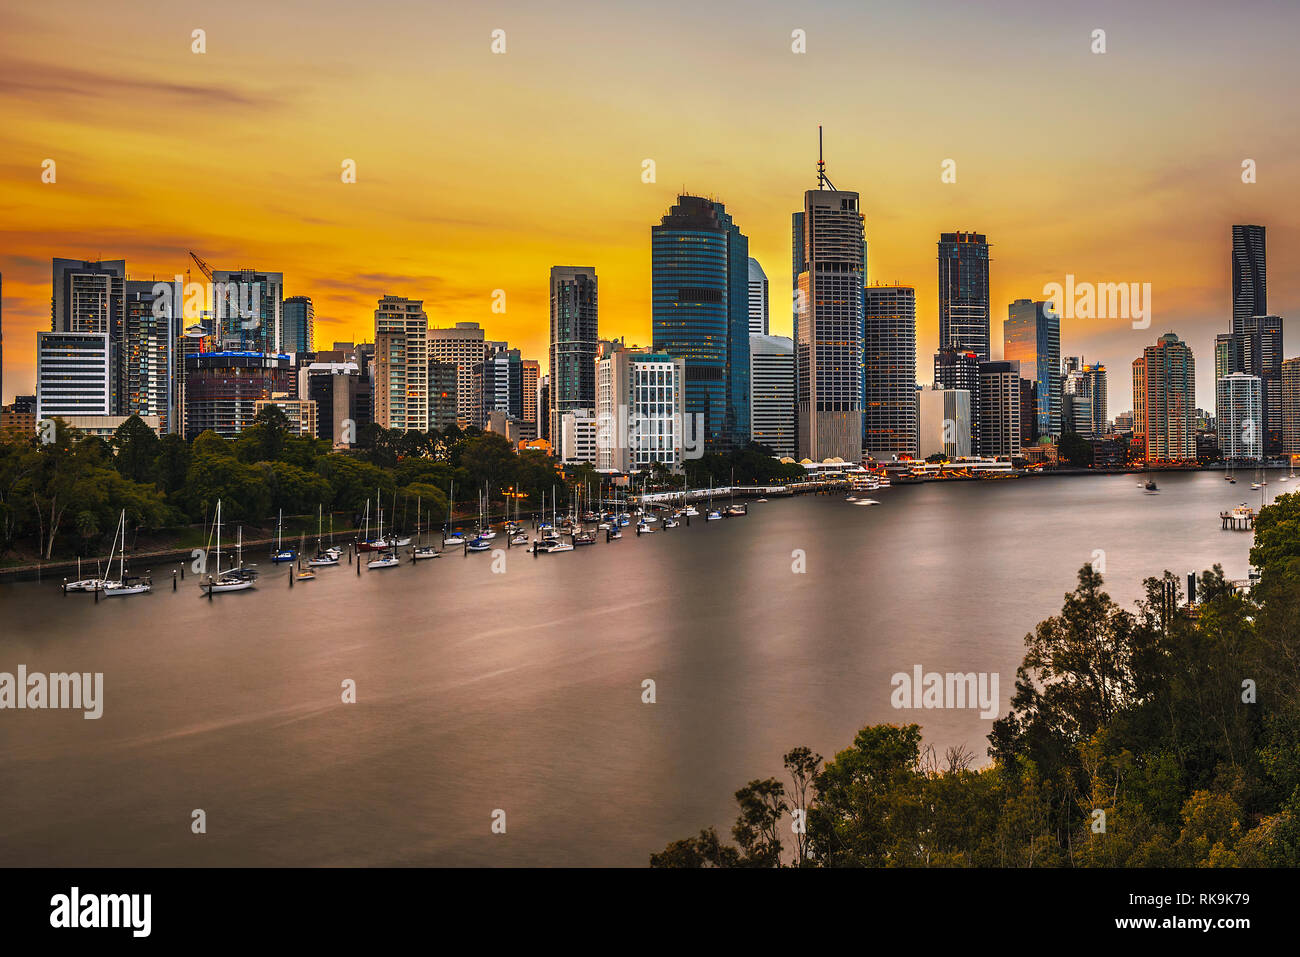 Sunset skyline of Brisbane city and Brisbane river - Stock Image